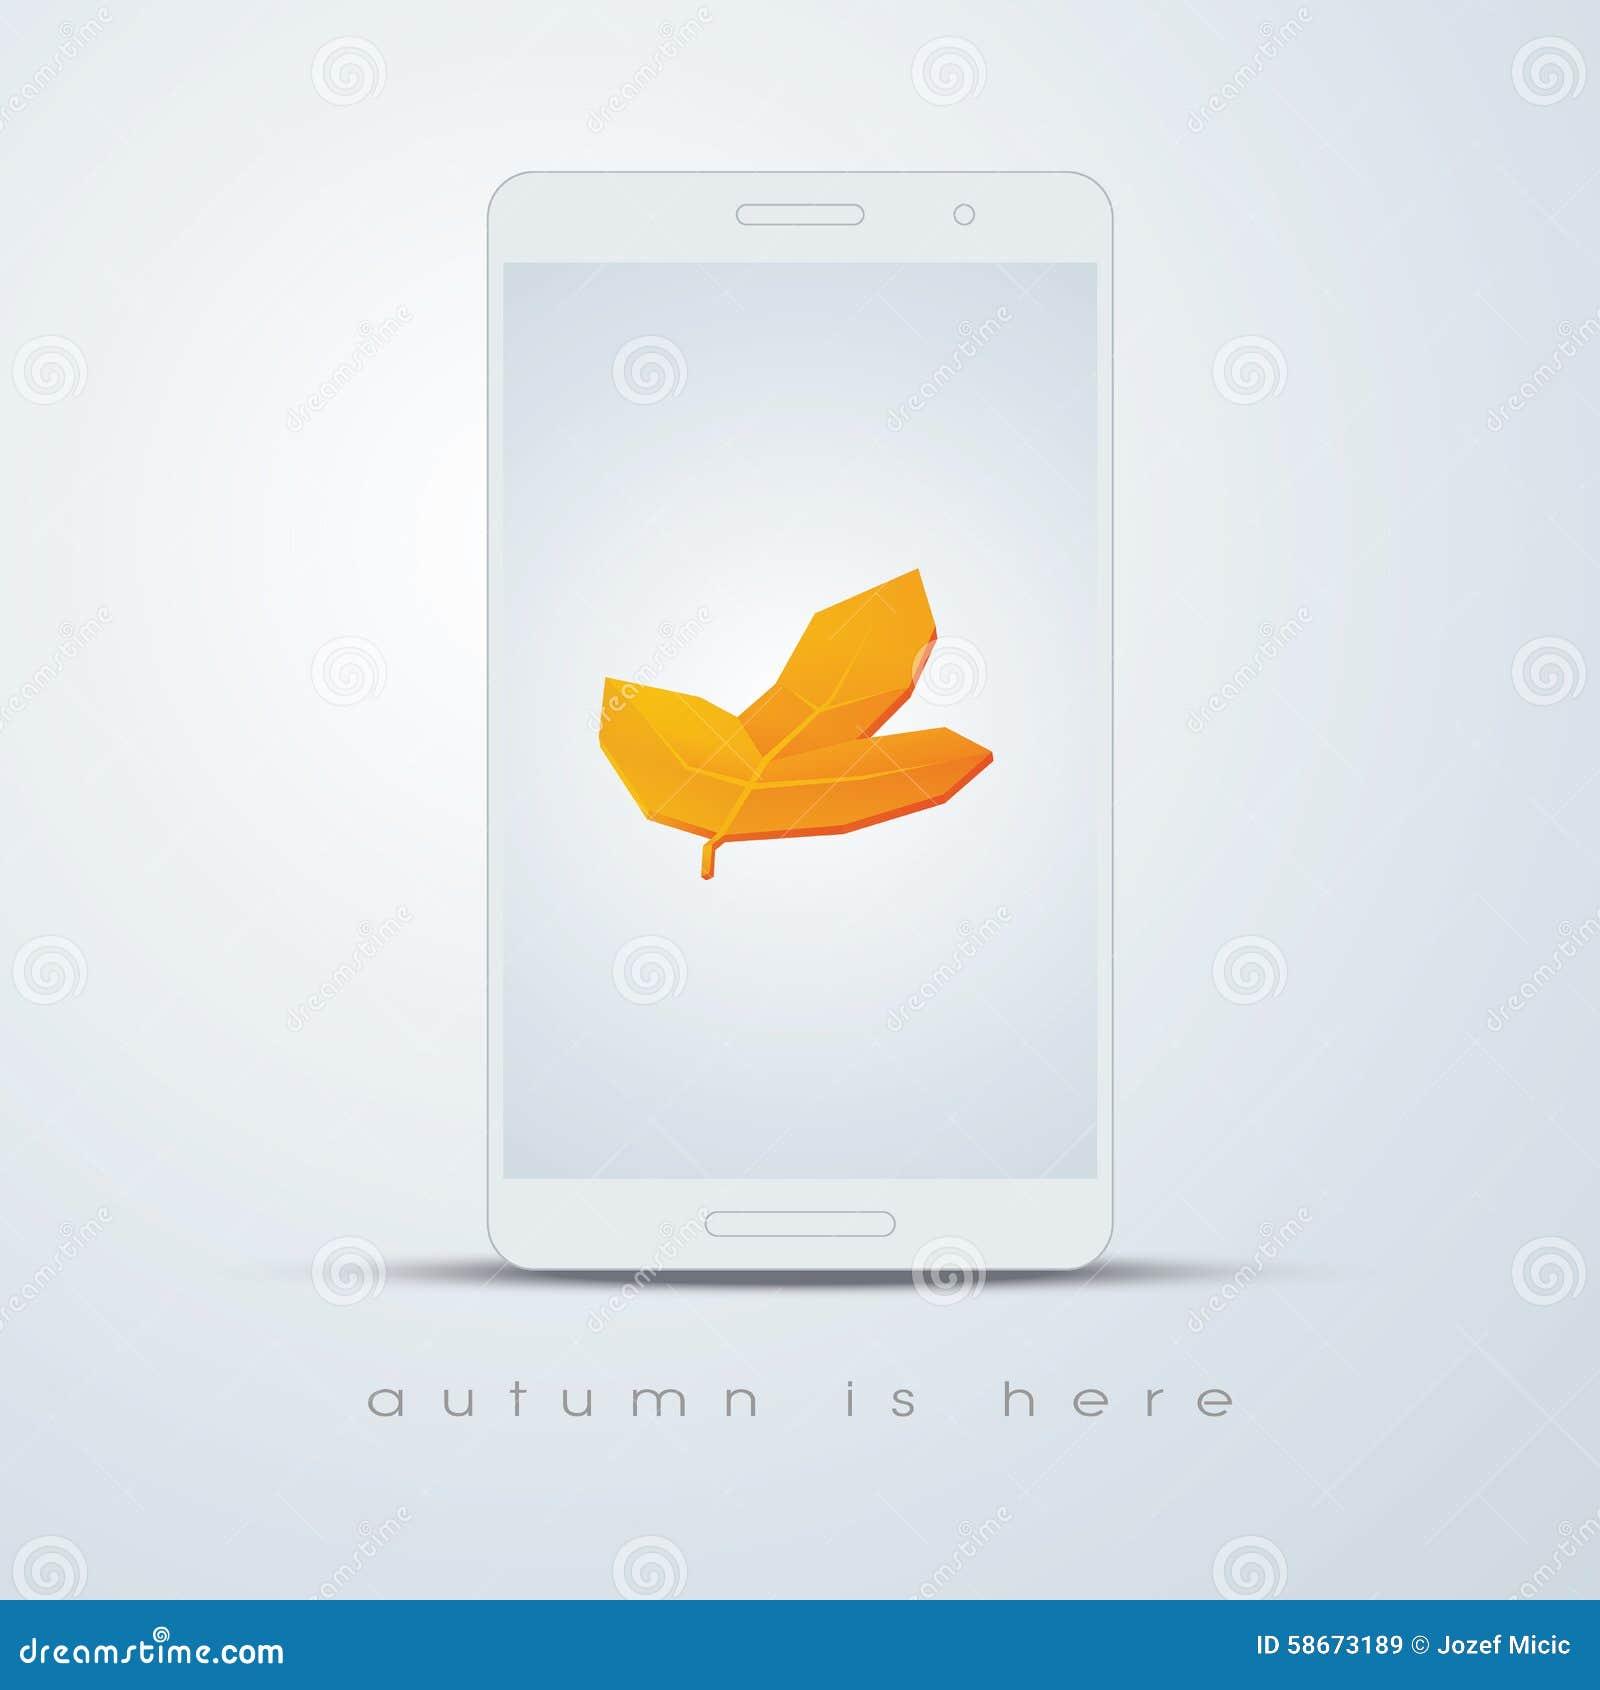 Autumn Leaf On Smartphone Screen Foliage Symbol Stock Vector